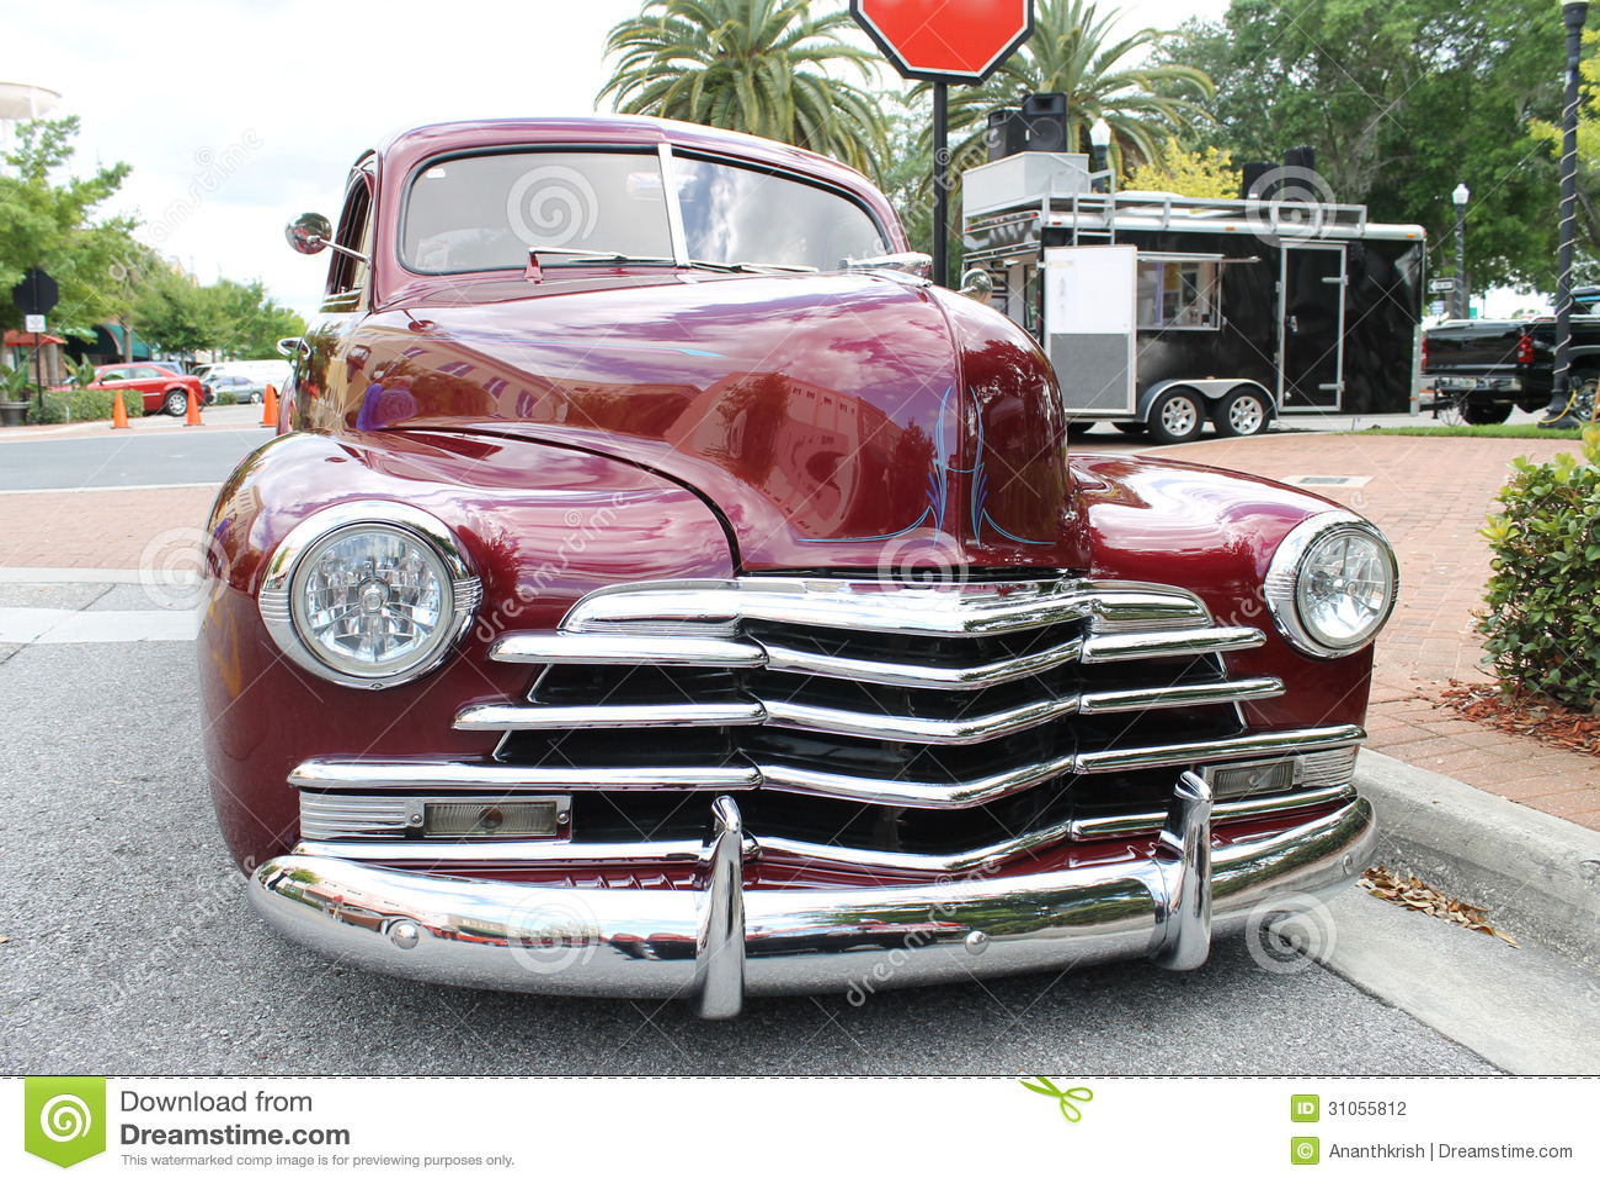 Old Chevrolet Car Stock Photo 31055812 - Megapixl